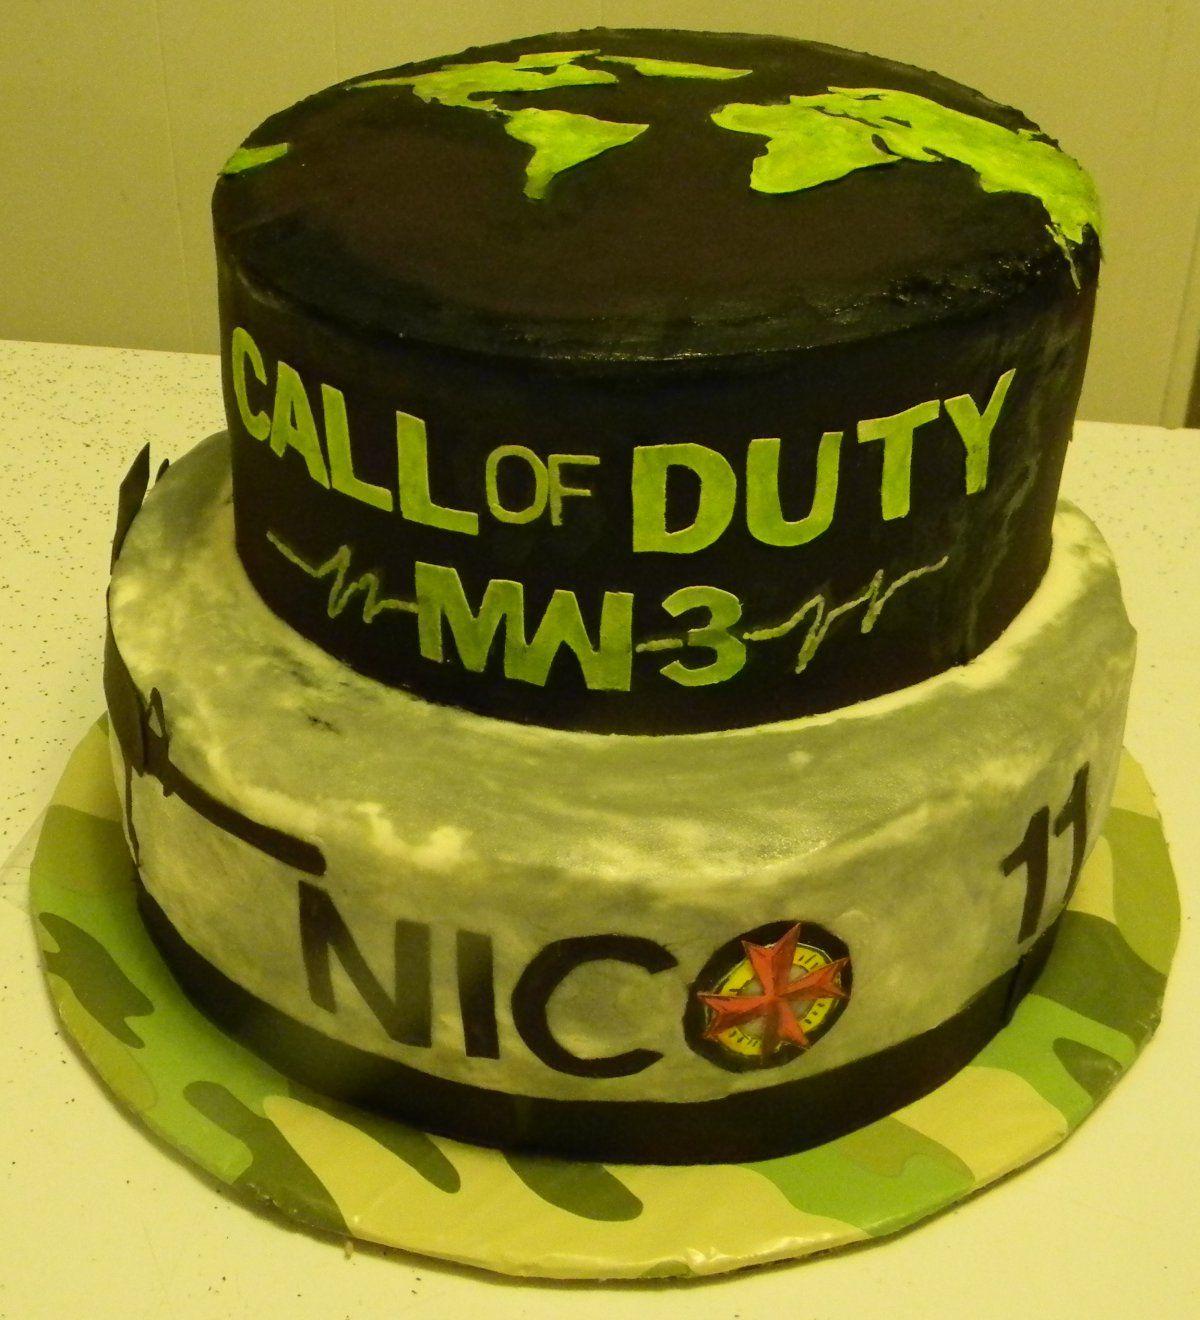 call of duty birthday cakes Call of Duty Modern Warfare 3 cake